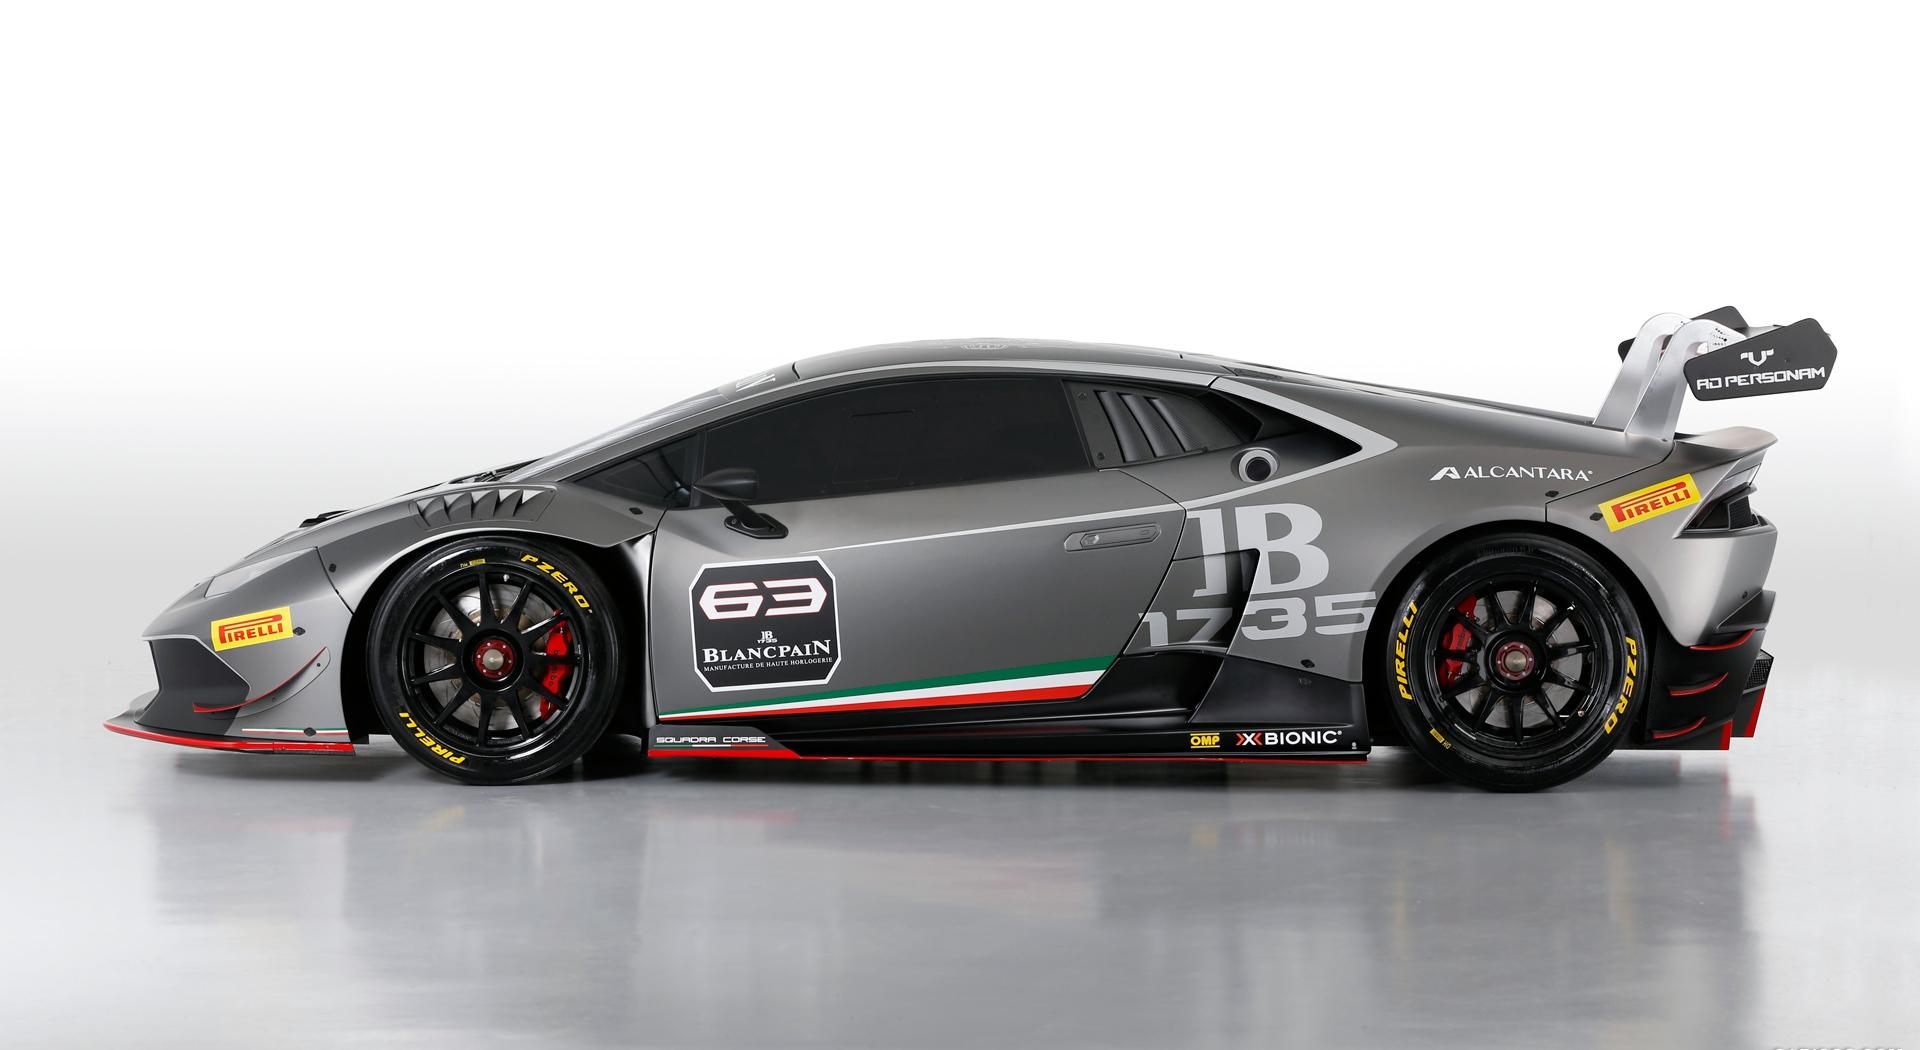 Lamborghini Huracan Lp 610 4 Polizia Hd Desktop Wallpapers 4k Hd